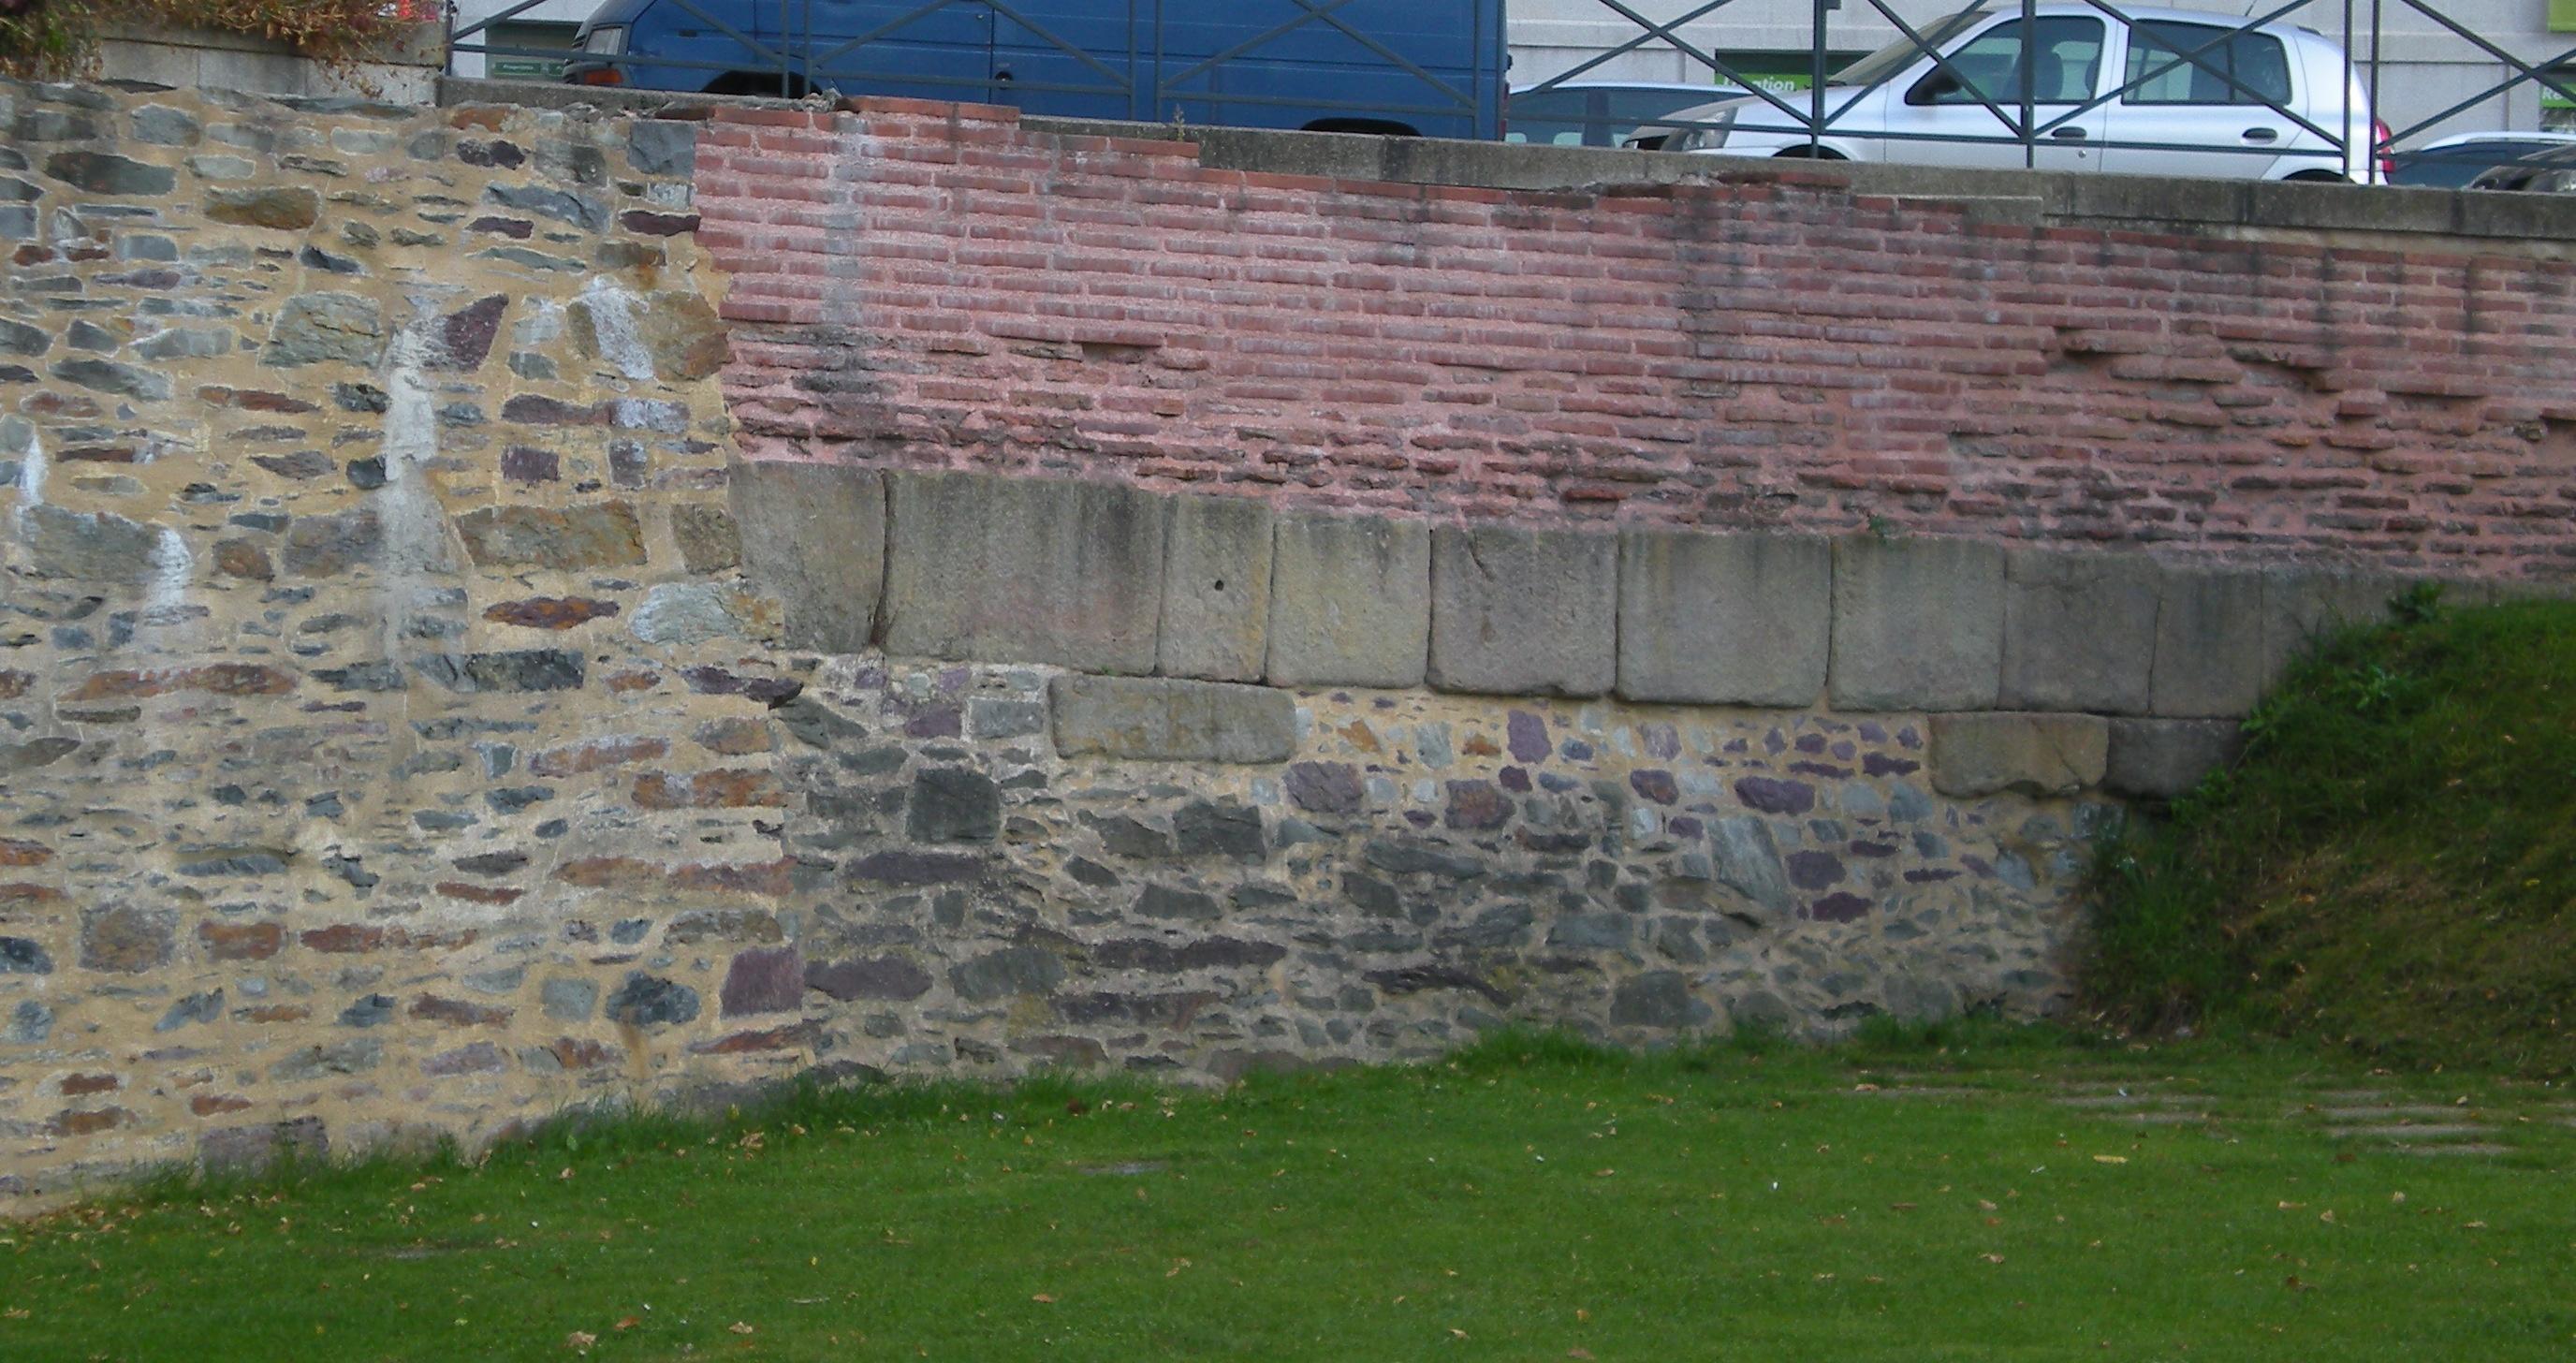 File:Roman wall of Rennes.jpg - Wikimedia Commons